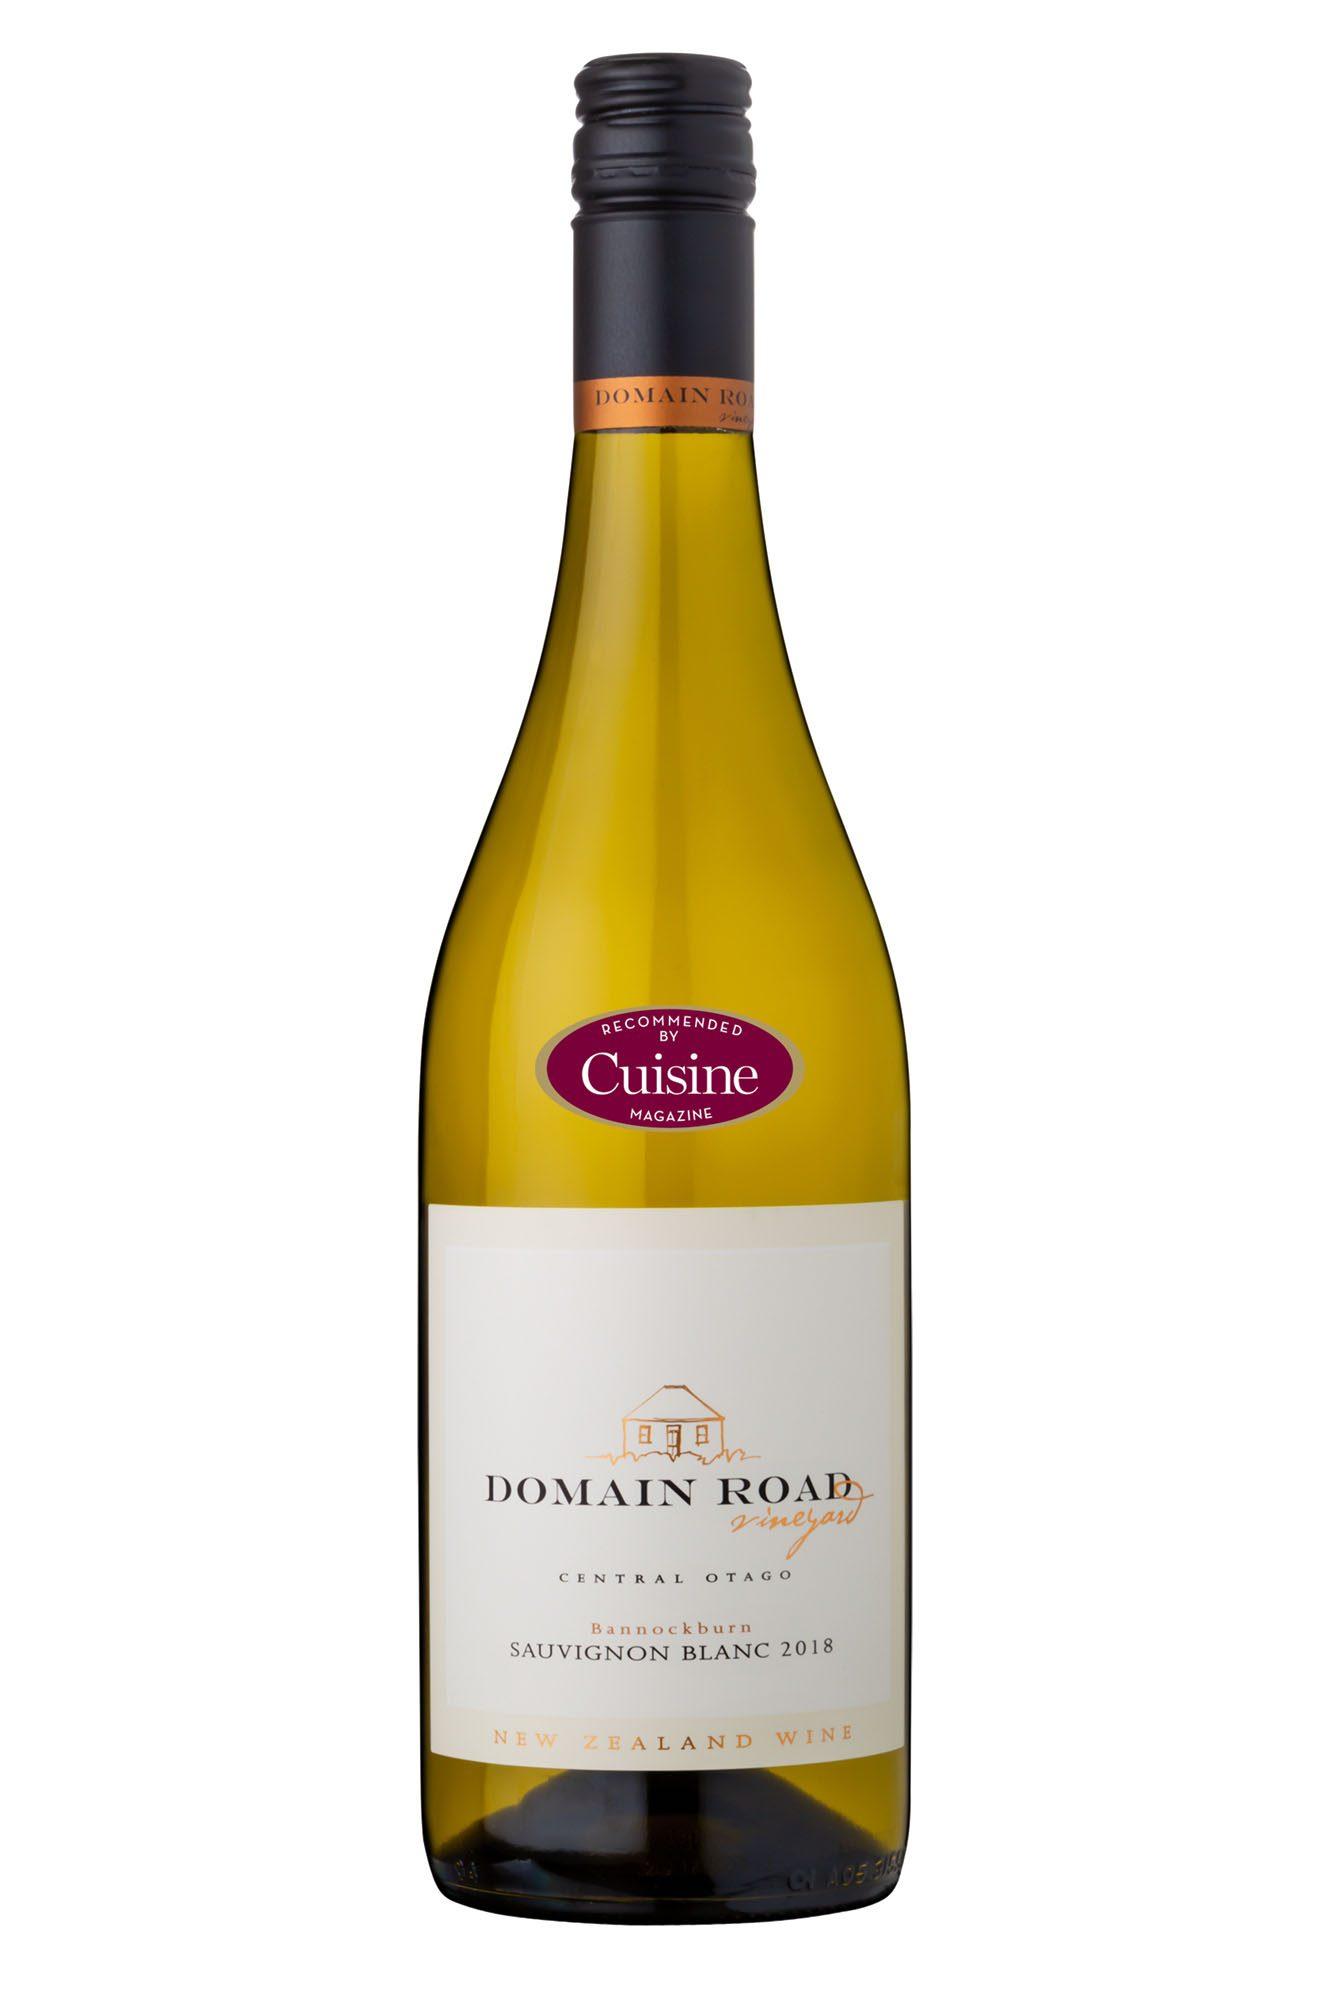 Domain Road Vineyard Sauvignon Blanc 2018 Central Otago)